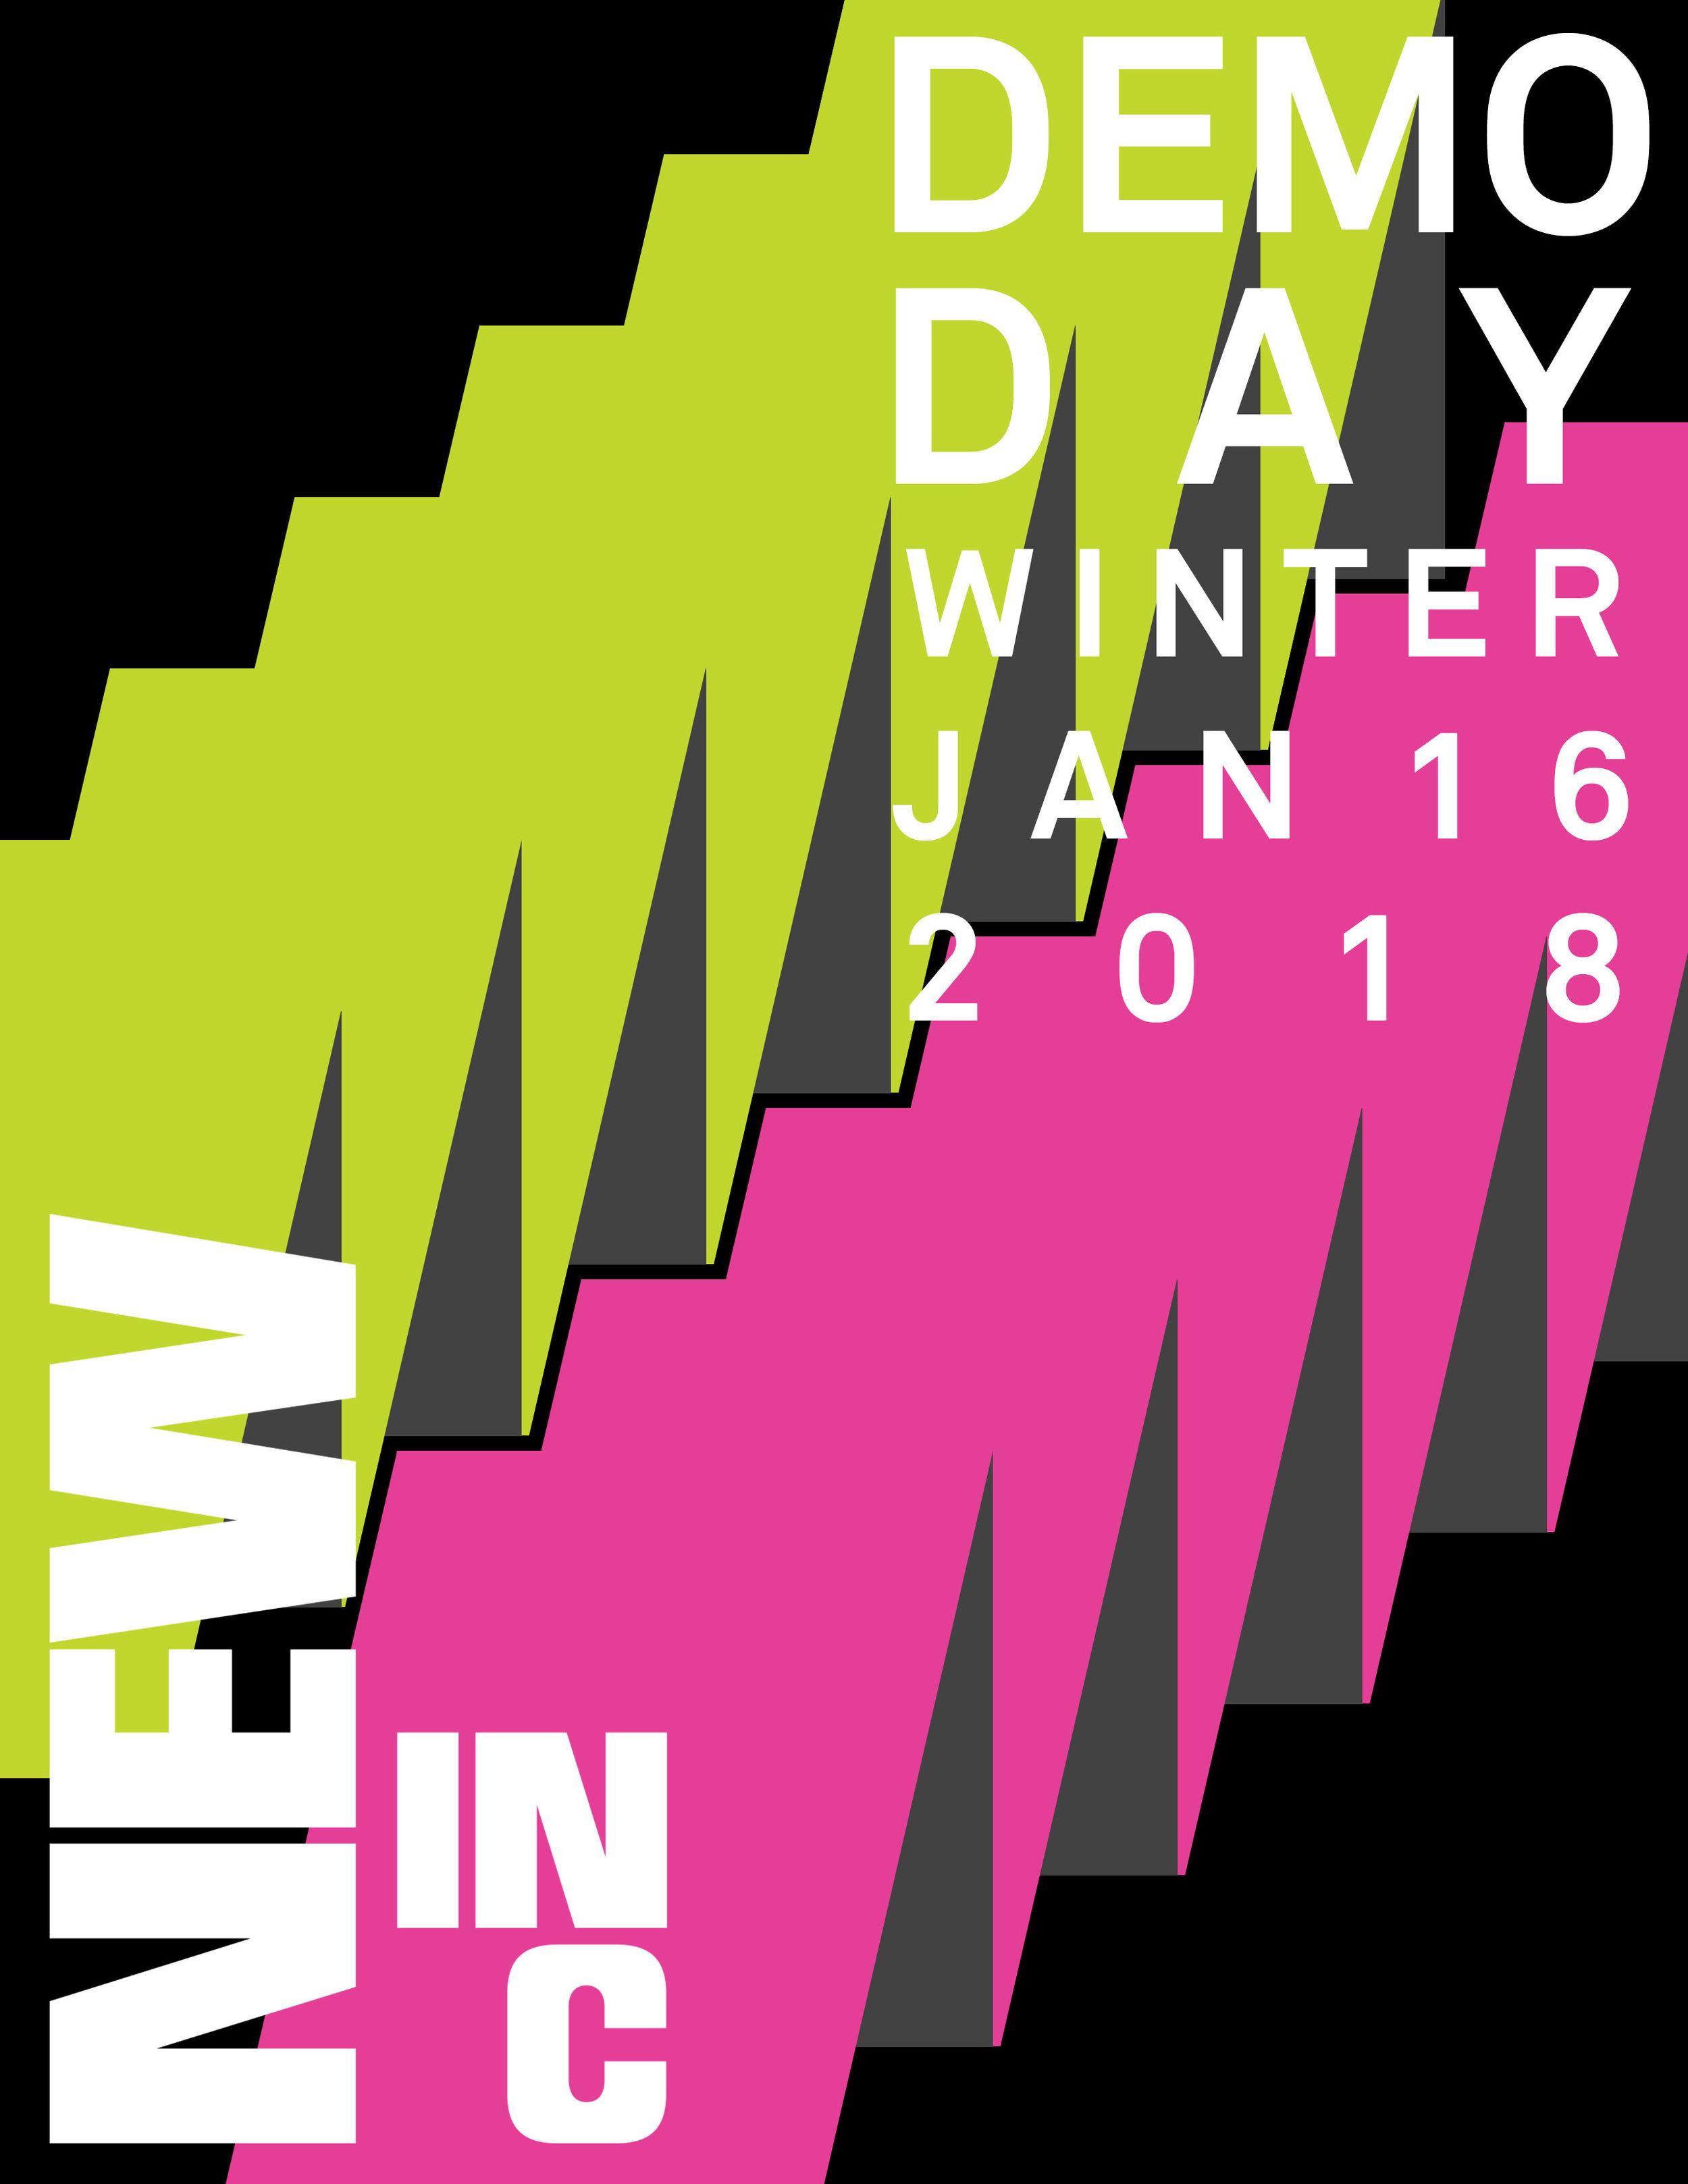 NEW INC Demo Day Winter 2018 (template).jpg